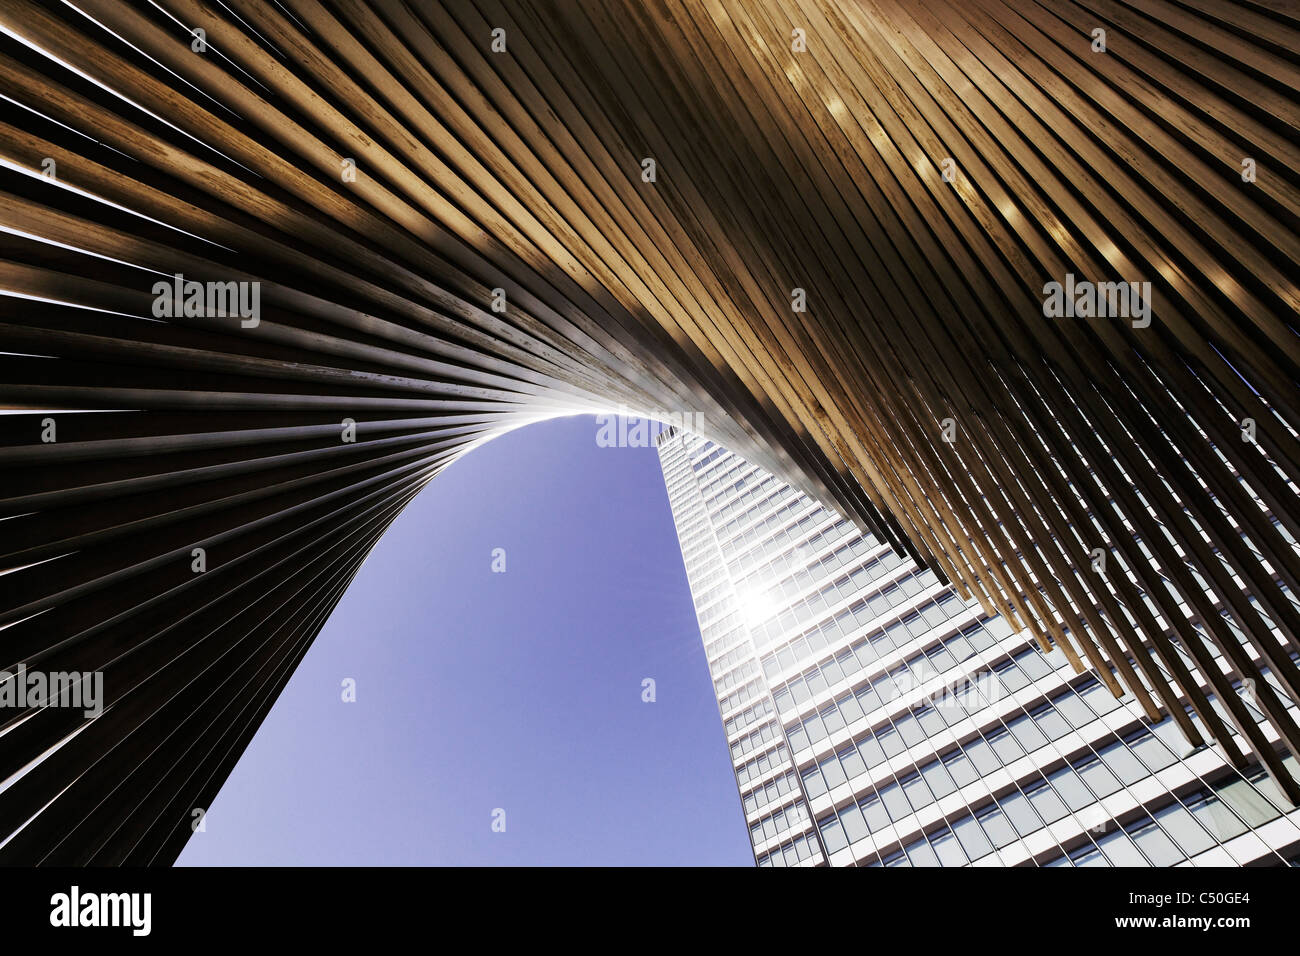 DZ Bank Tower, SELMI- città grattacielo, 142 metri di altezza, creativo, urban, Platz der Republik, Frankfurt Immagini Stock